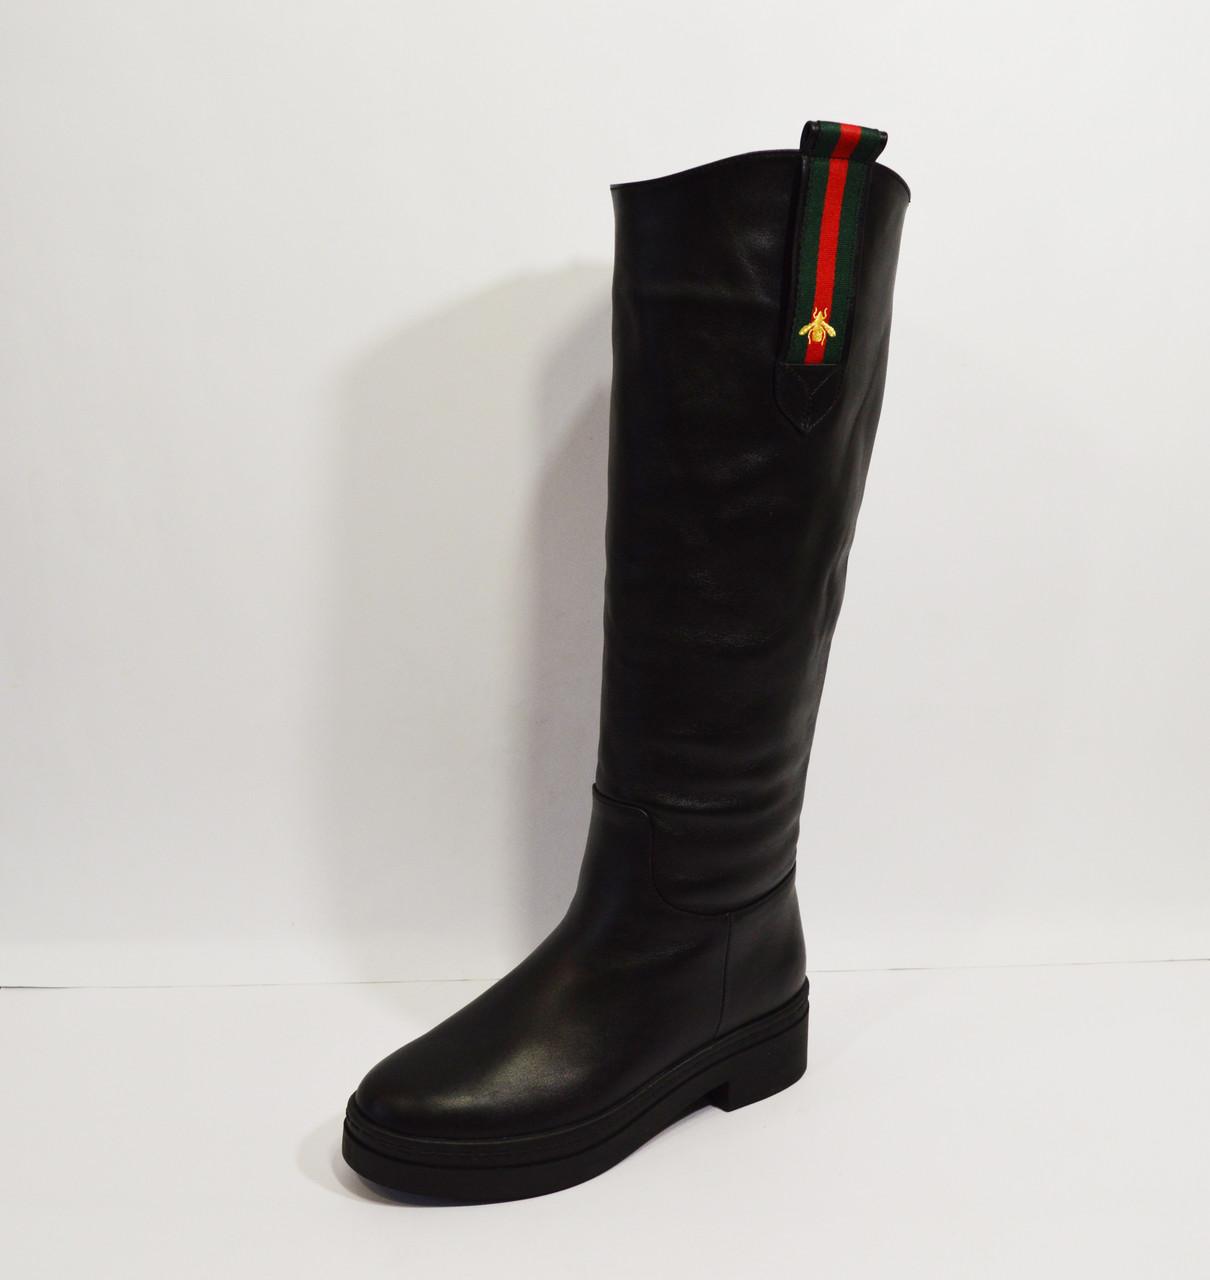 08137b00 Сапоги женские зимние кожаные Kluchini - КРЕЩАТИК - интернет магазин обуви  в Александрии